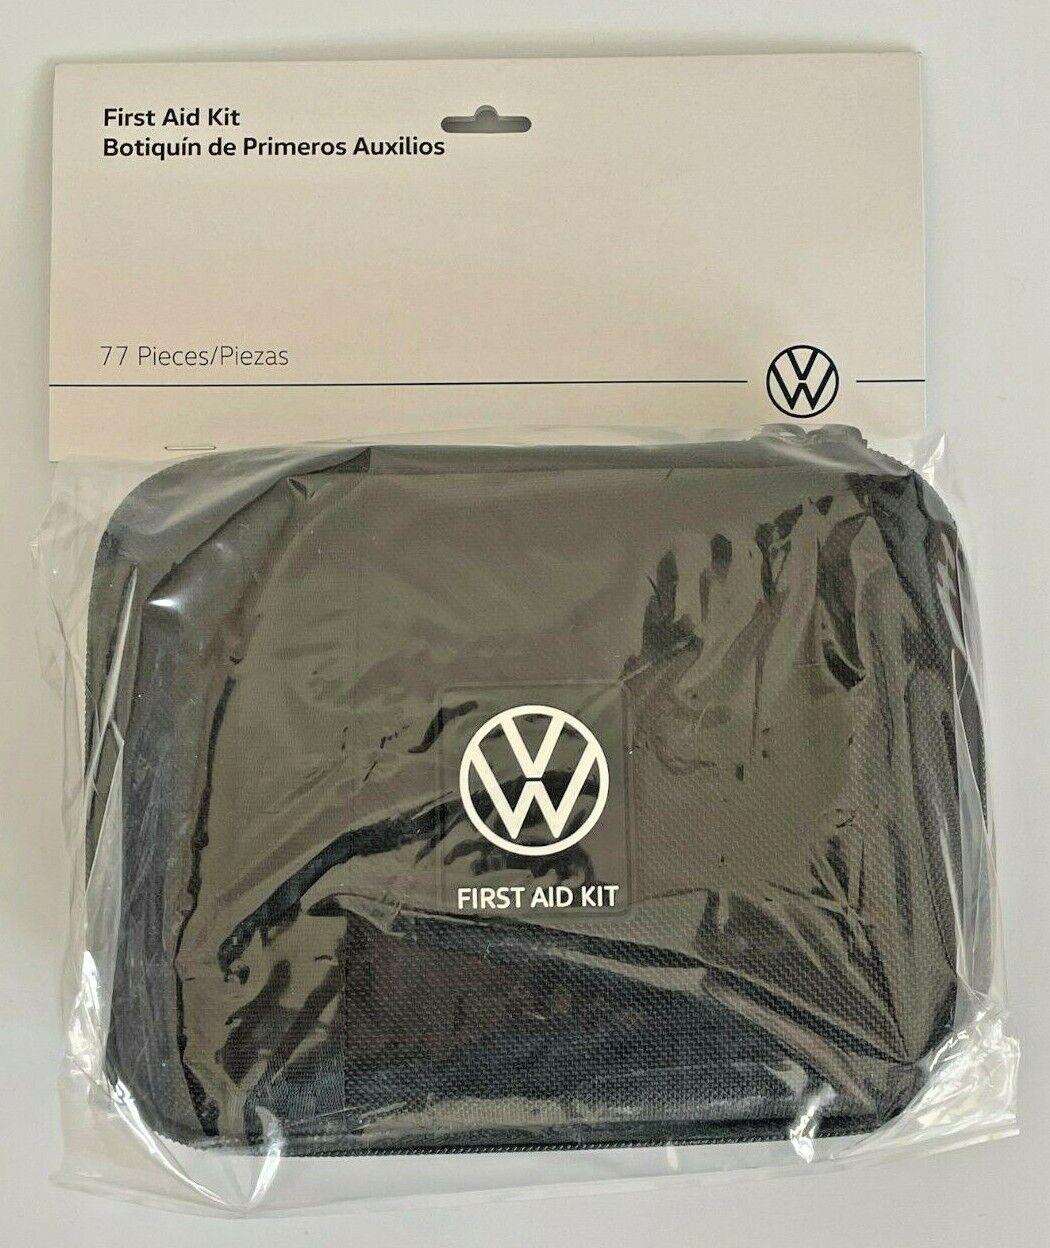 Volkswagen VW OEM First Aid Kit 000.093.108.L.9B9 Auto Safety Kit 20200619 New